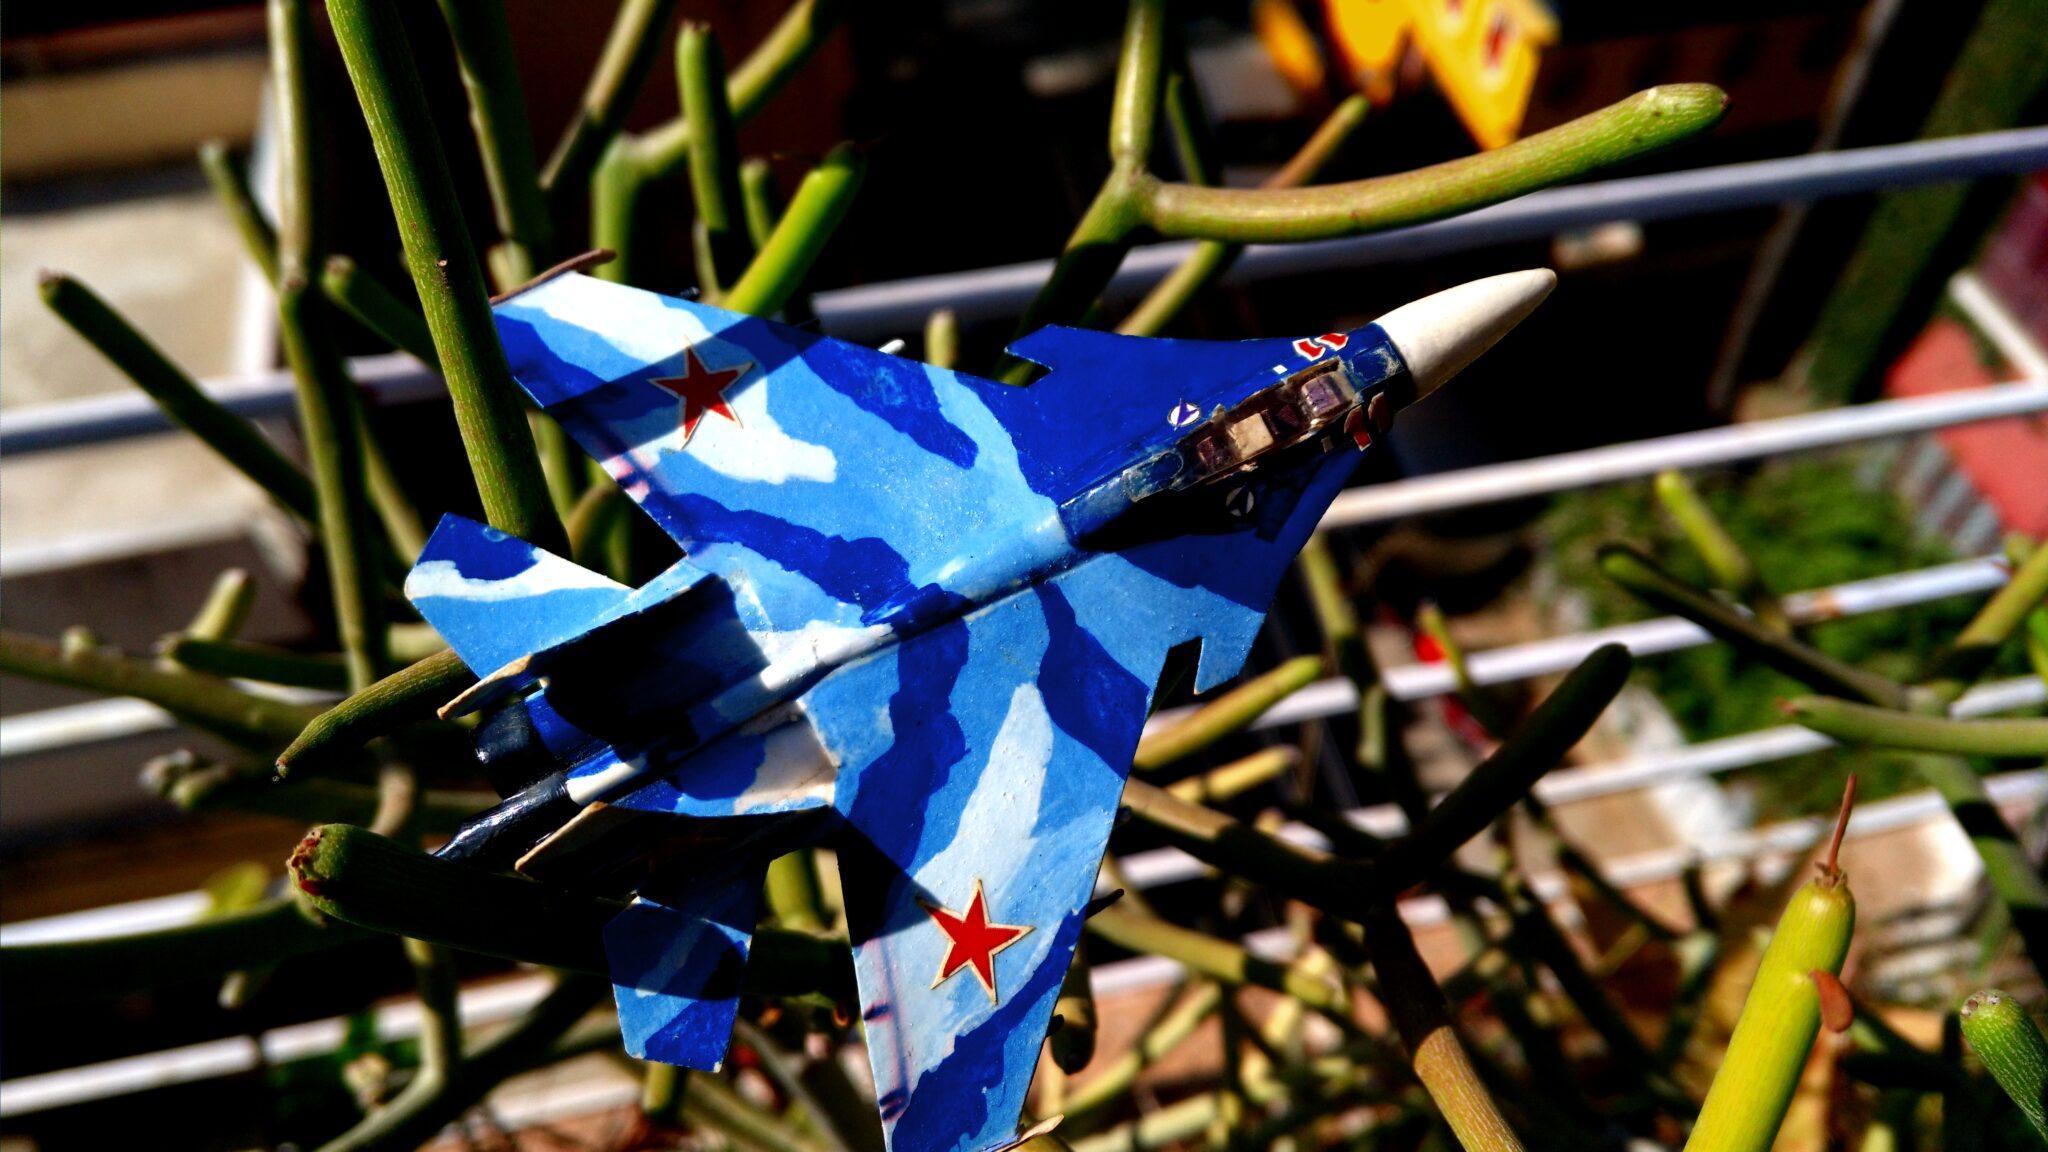 Miniature Fighter Jet